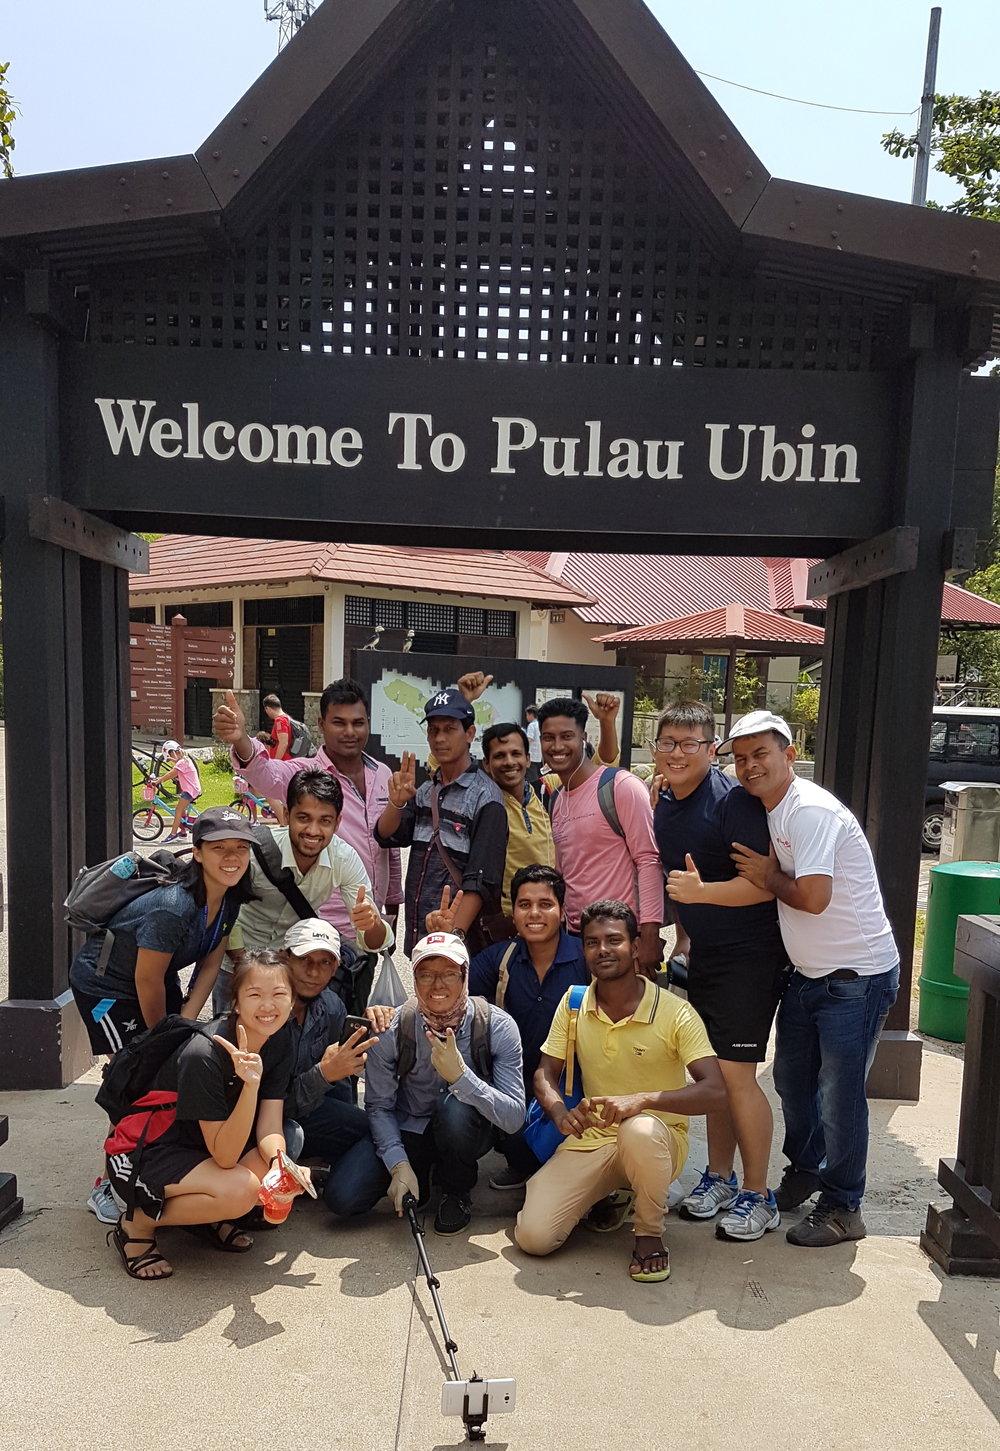 Fun day out at Pulau Ubin